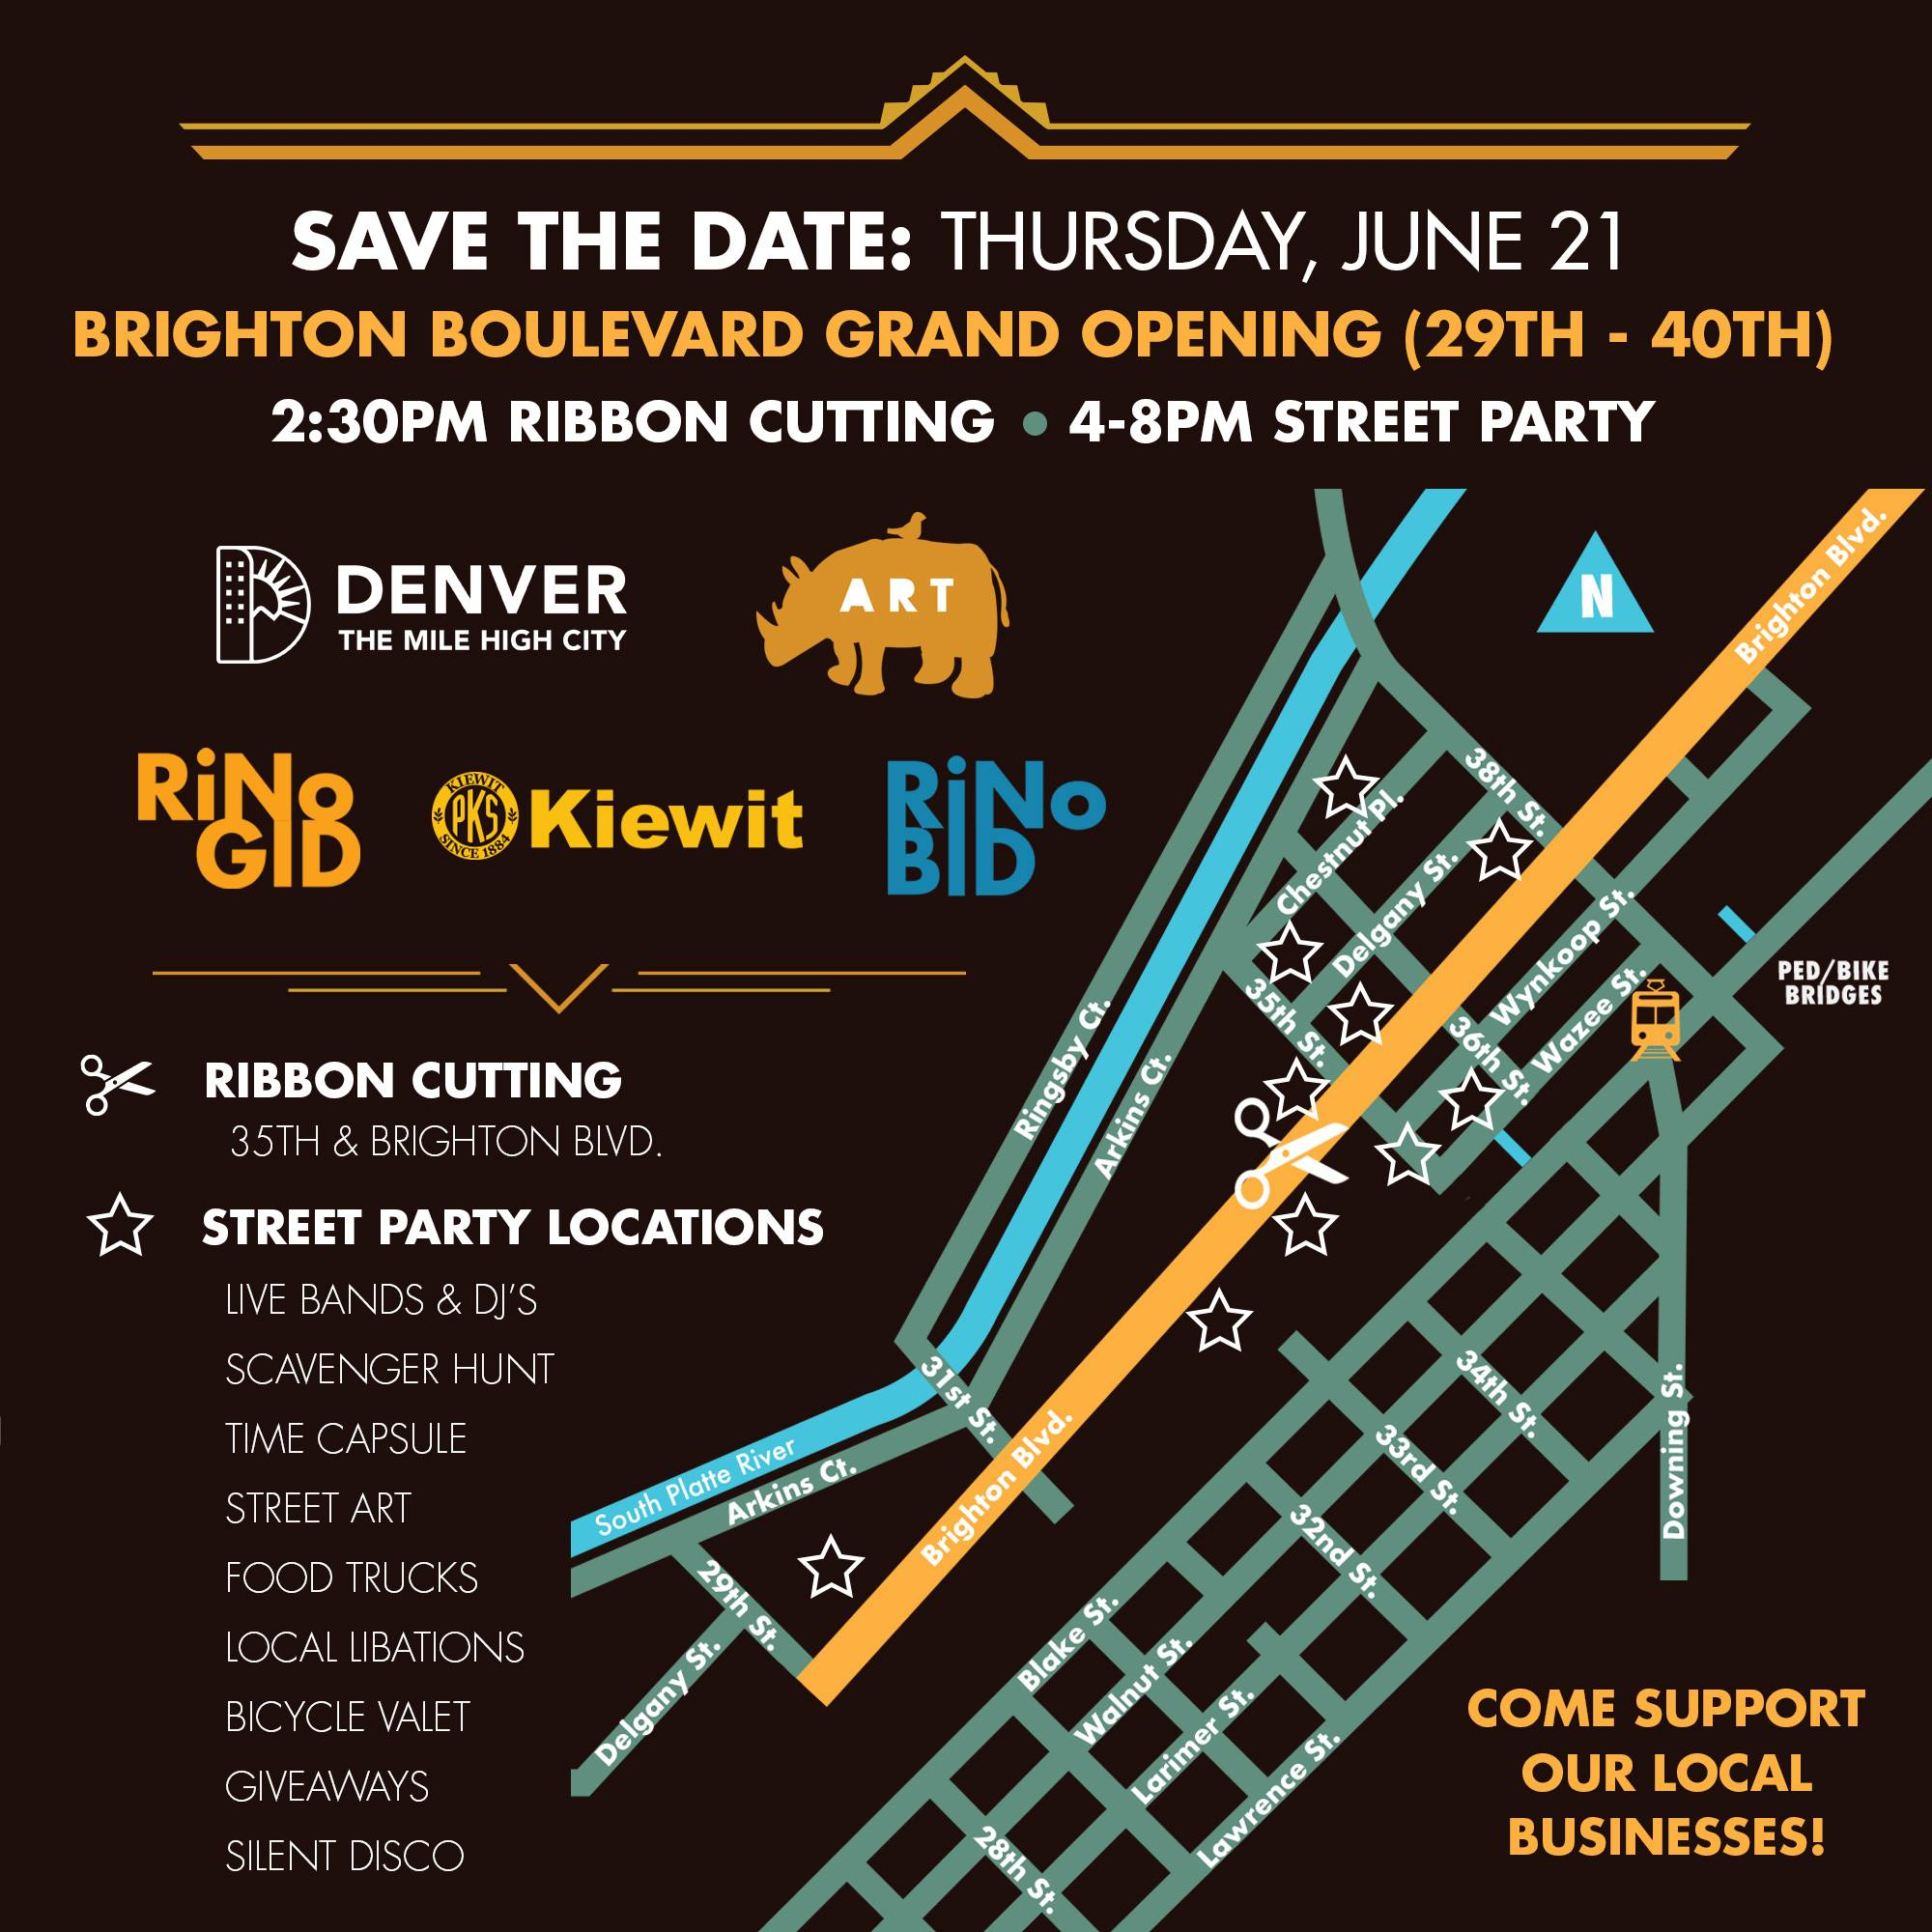 Brighton Boulevard Grand Opening Rino Art District Denver Co